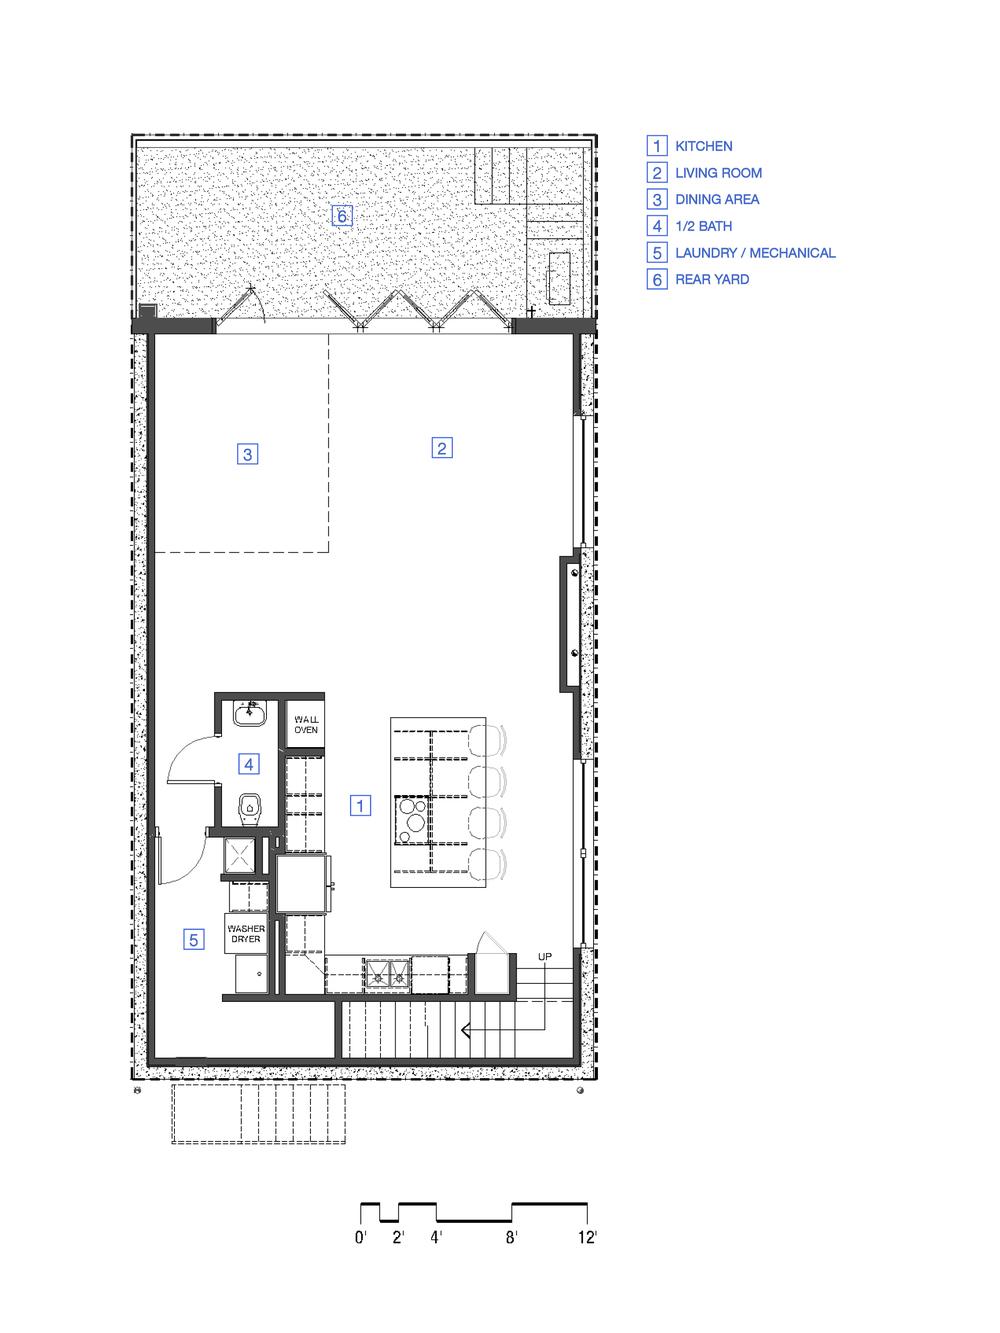 Ground Floor - Unit 'A'